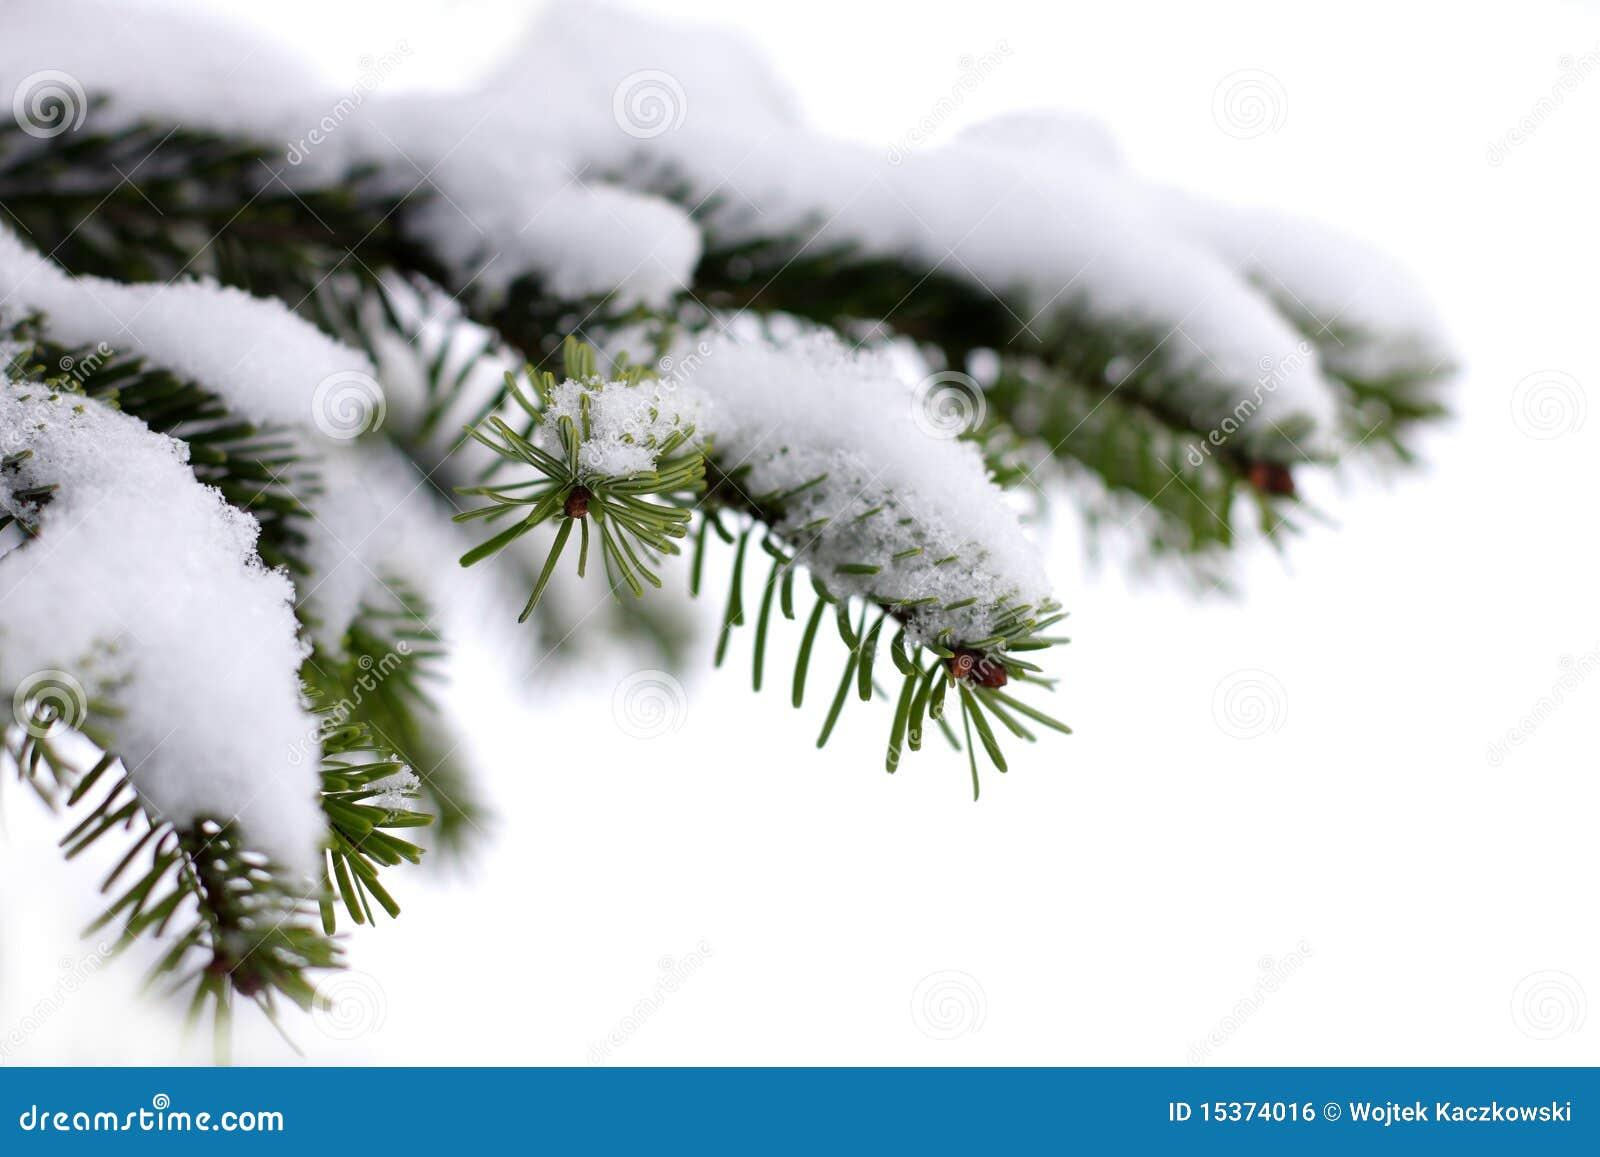 christmas evergreen spruce tree - photo #32